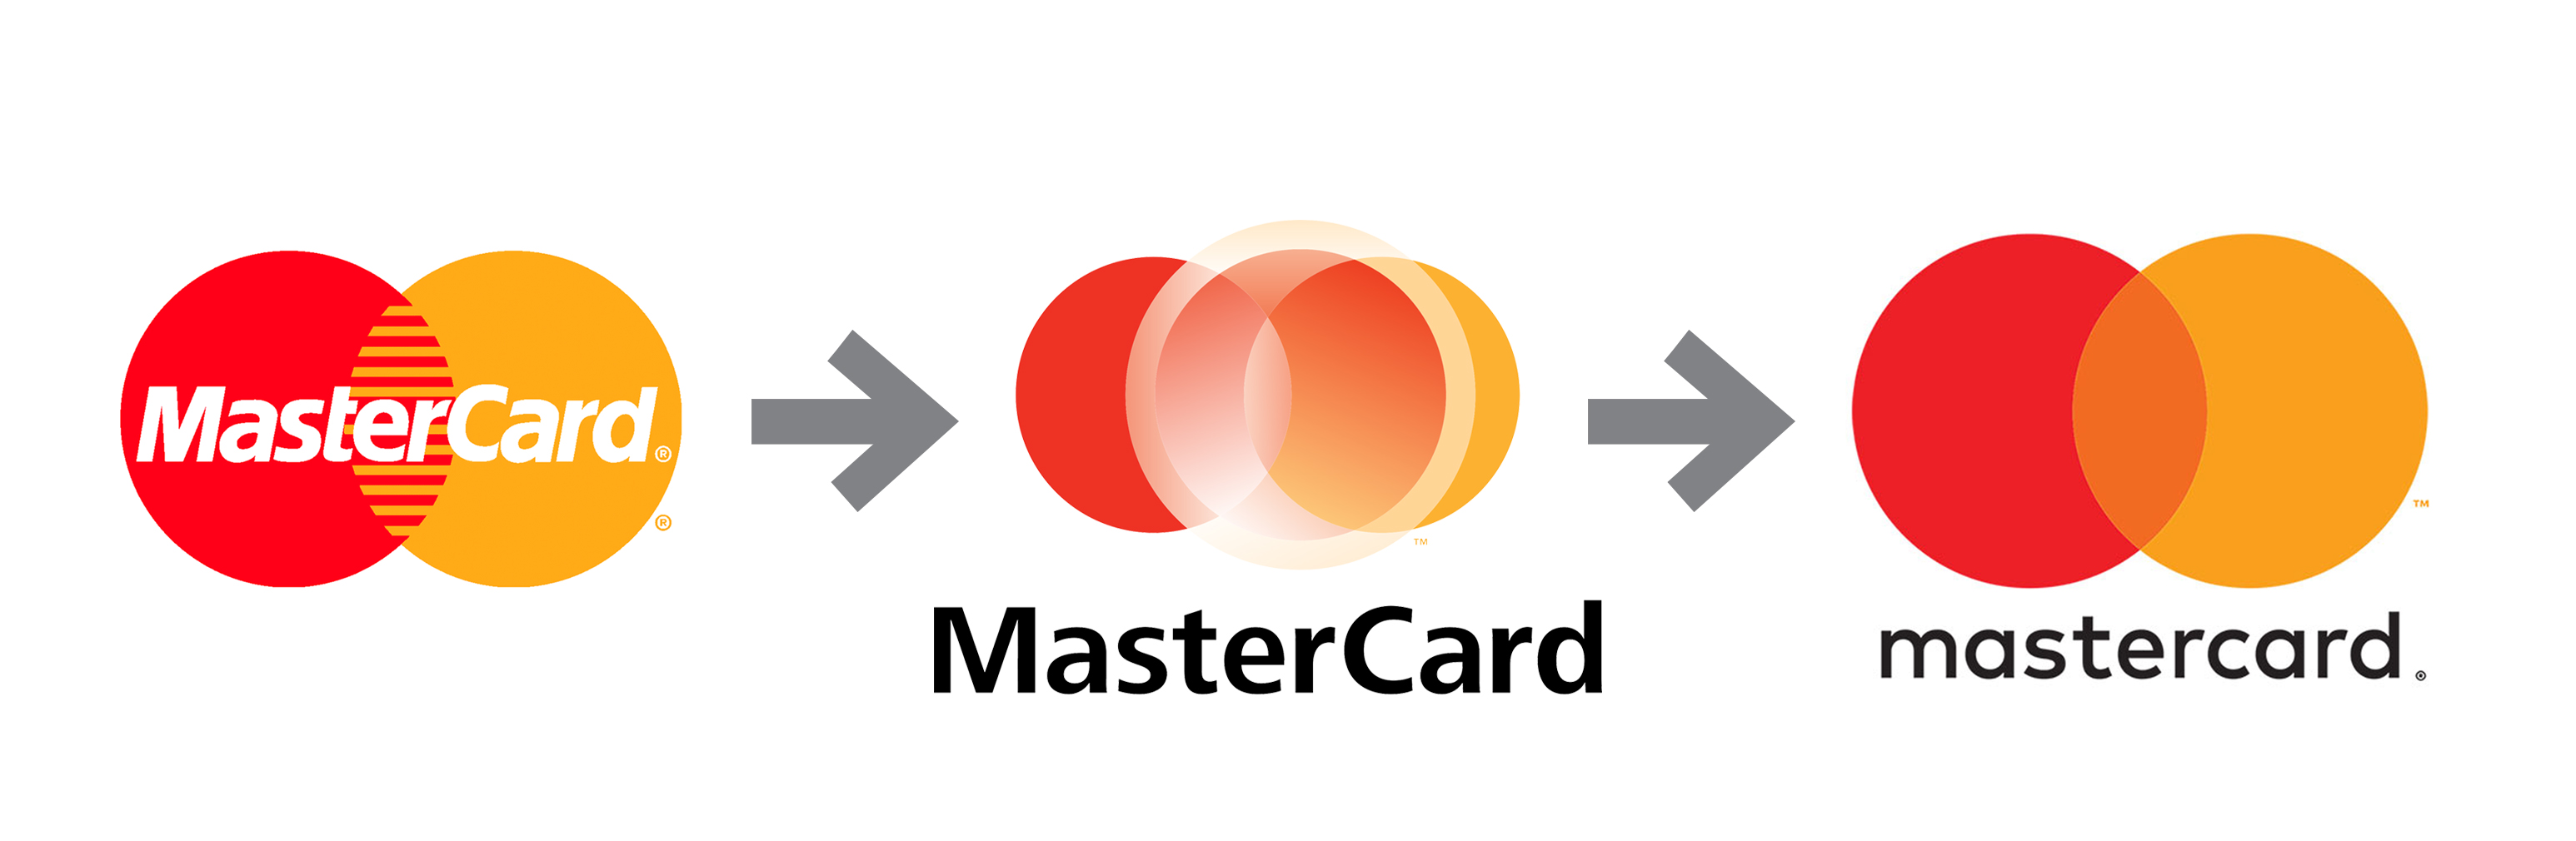 Logos_BeforeAfter_Mastercard2